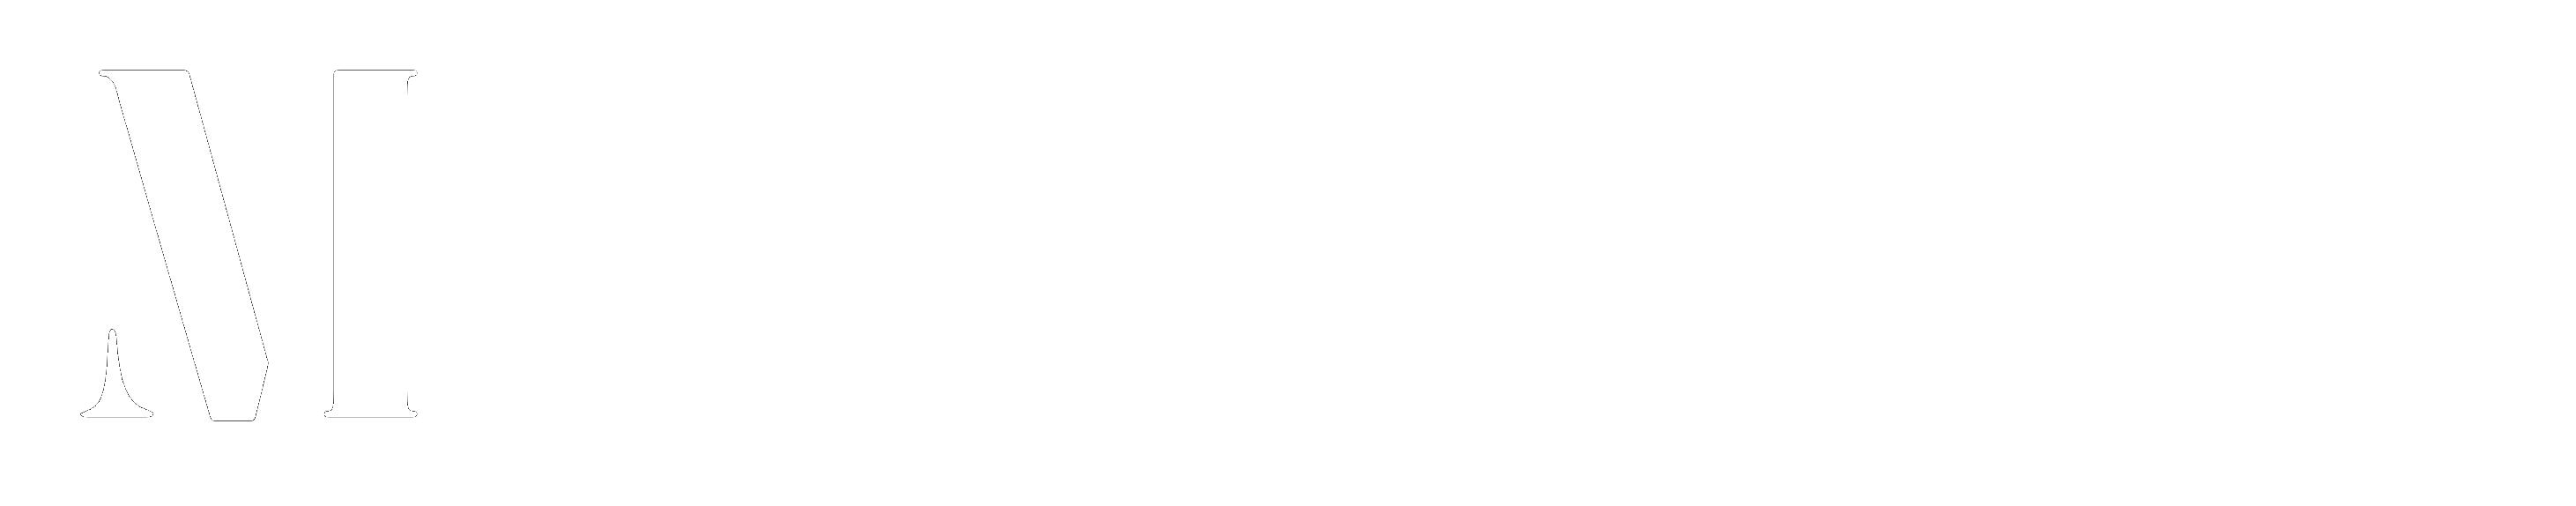 Mandekursus.dk-white